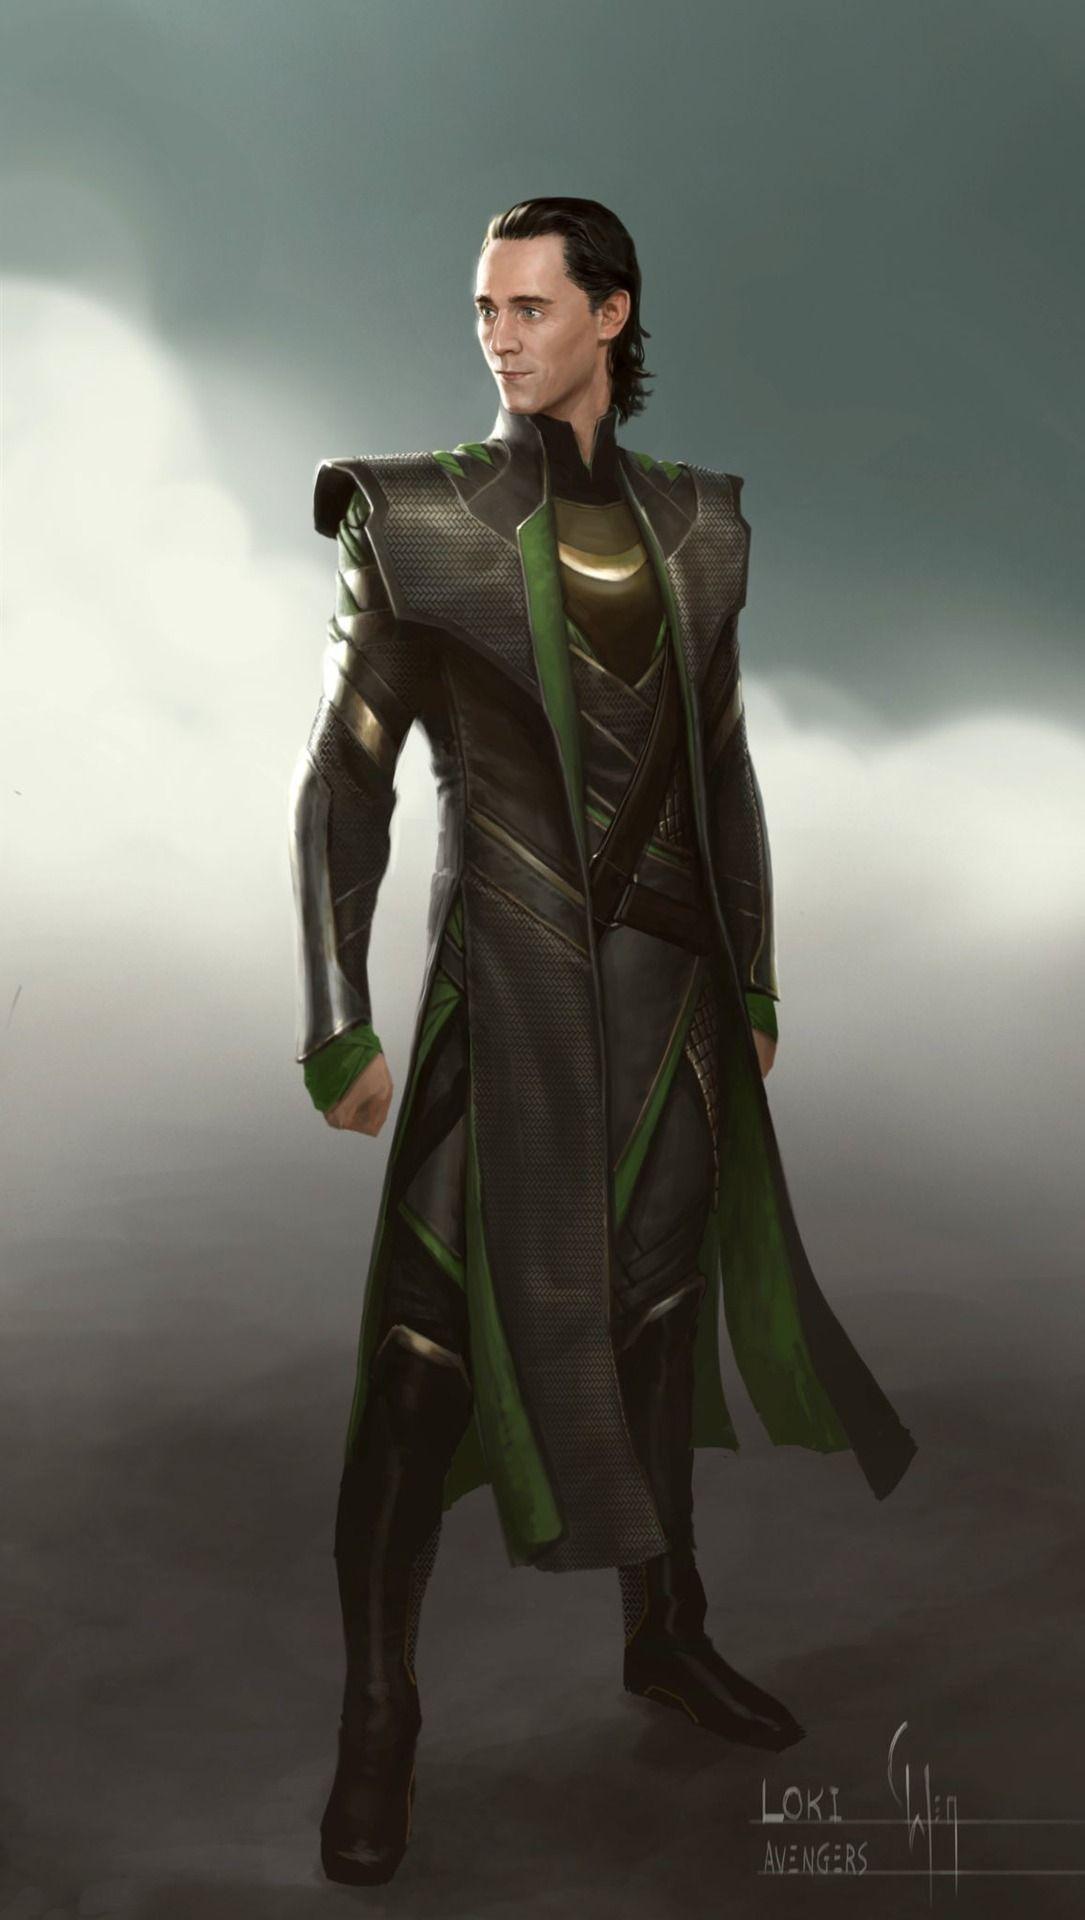 Pin by Kathryn on Loki and Thor | Loki character, Loki laufeyson, Loki